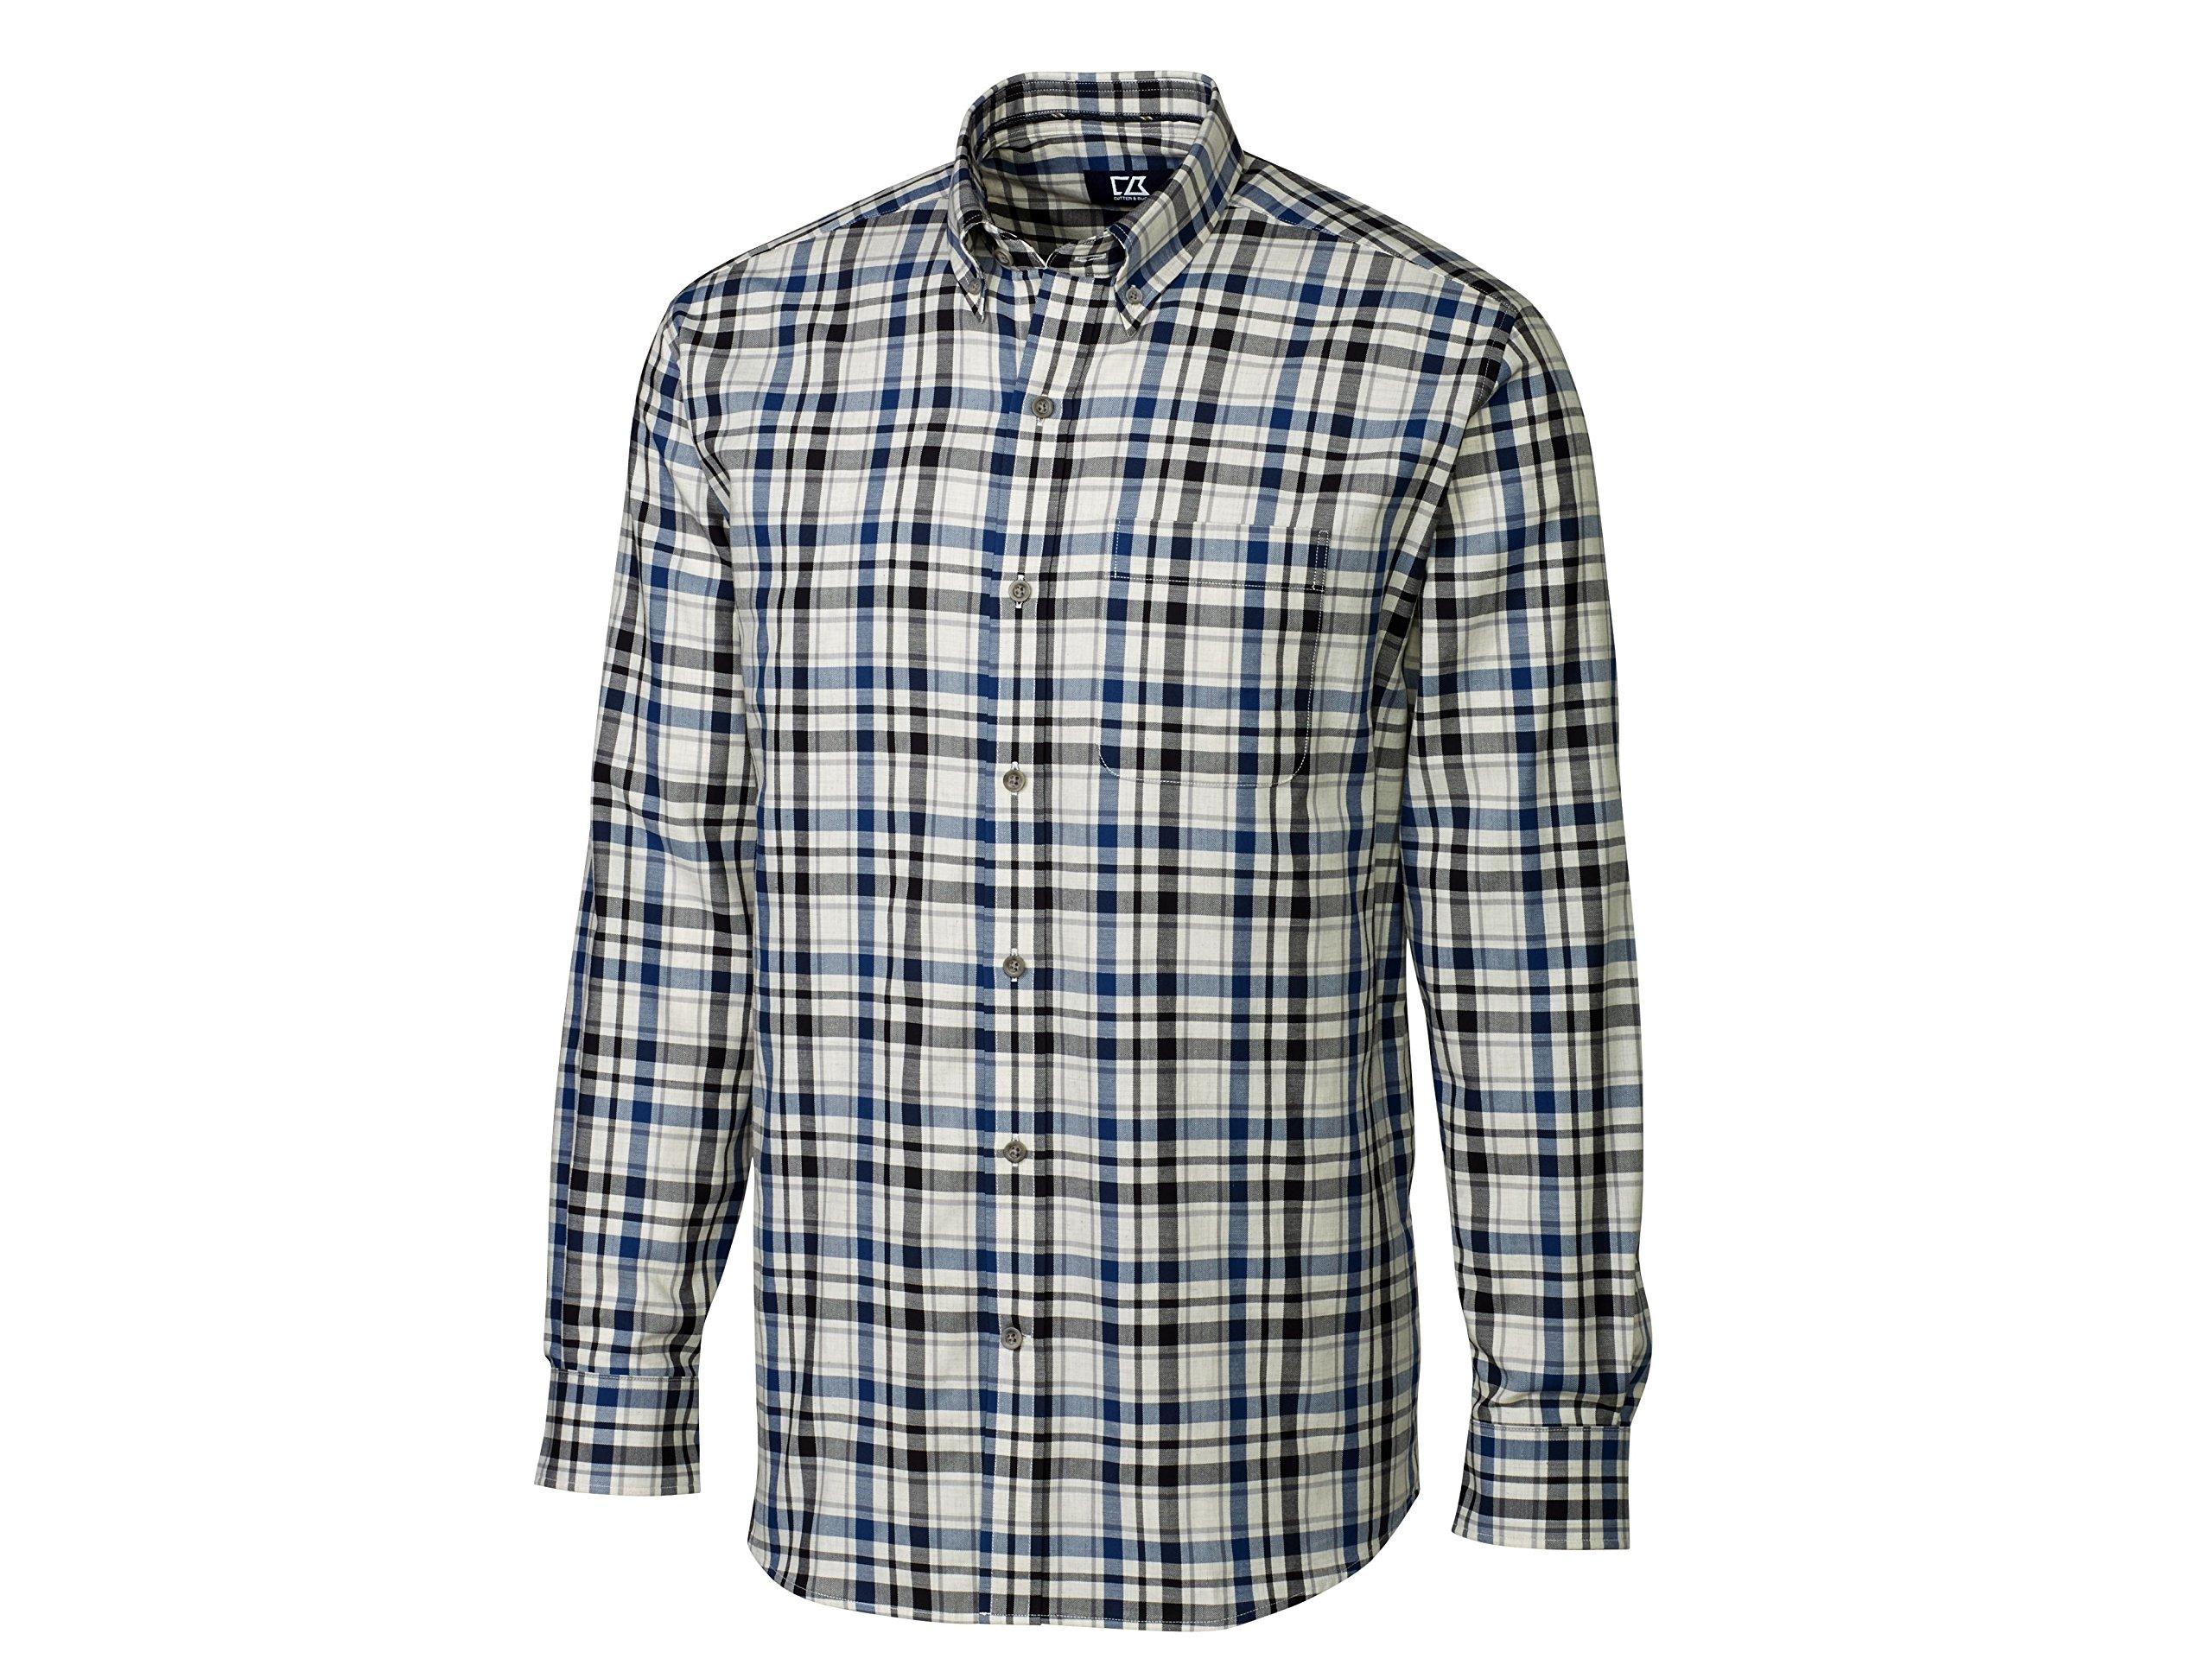 Cutter & Buck Men's Big-Tall Long Sleeve Roy Plaid Woven Shirt, Multi, 3X/Big